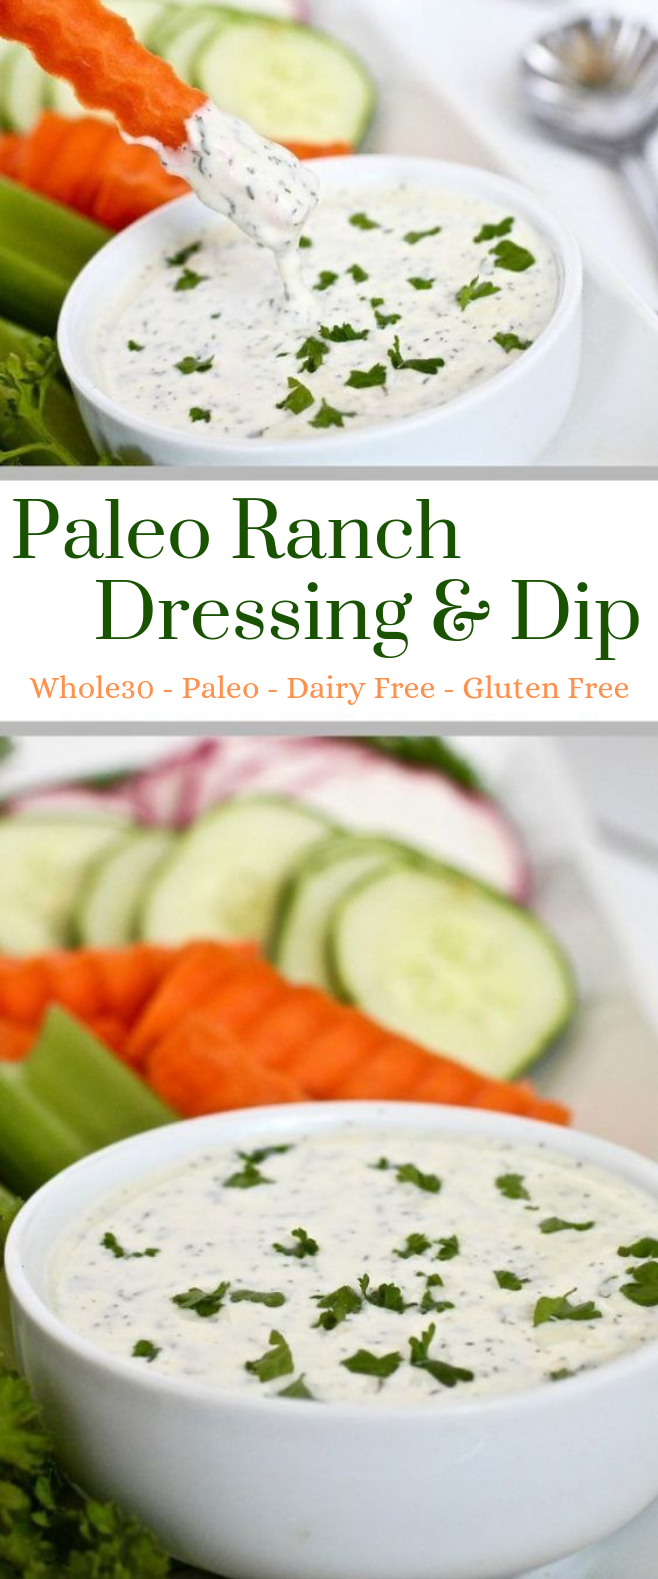 Paleo Ranch Dressing & Dip #Dip #Paleo